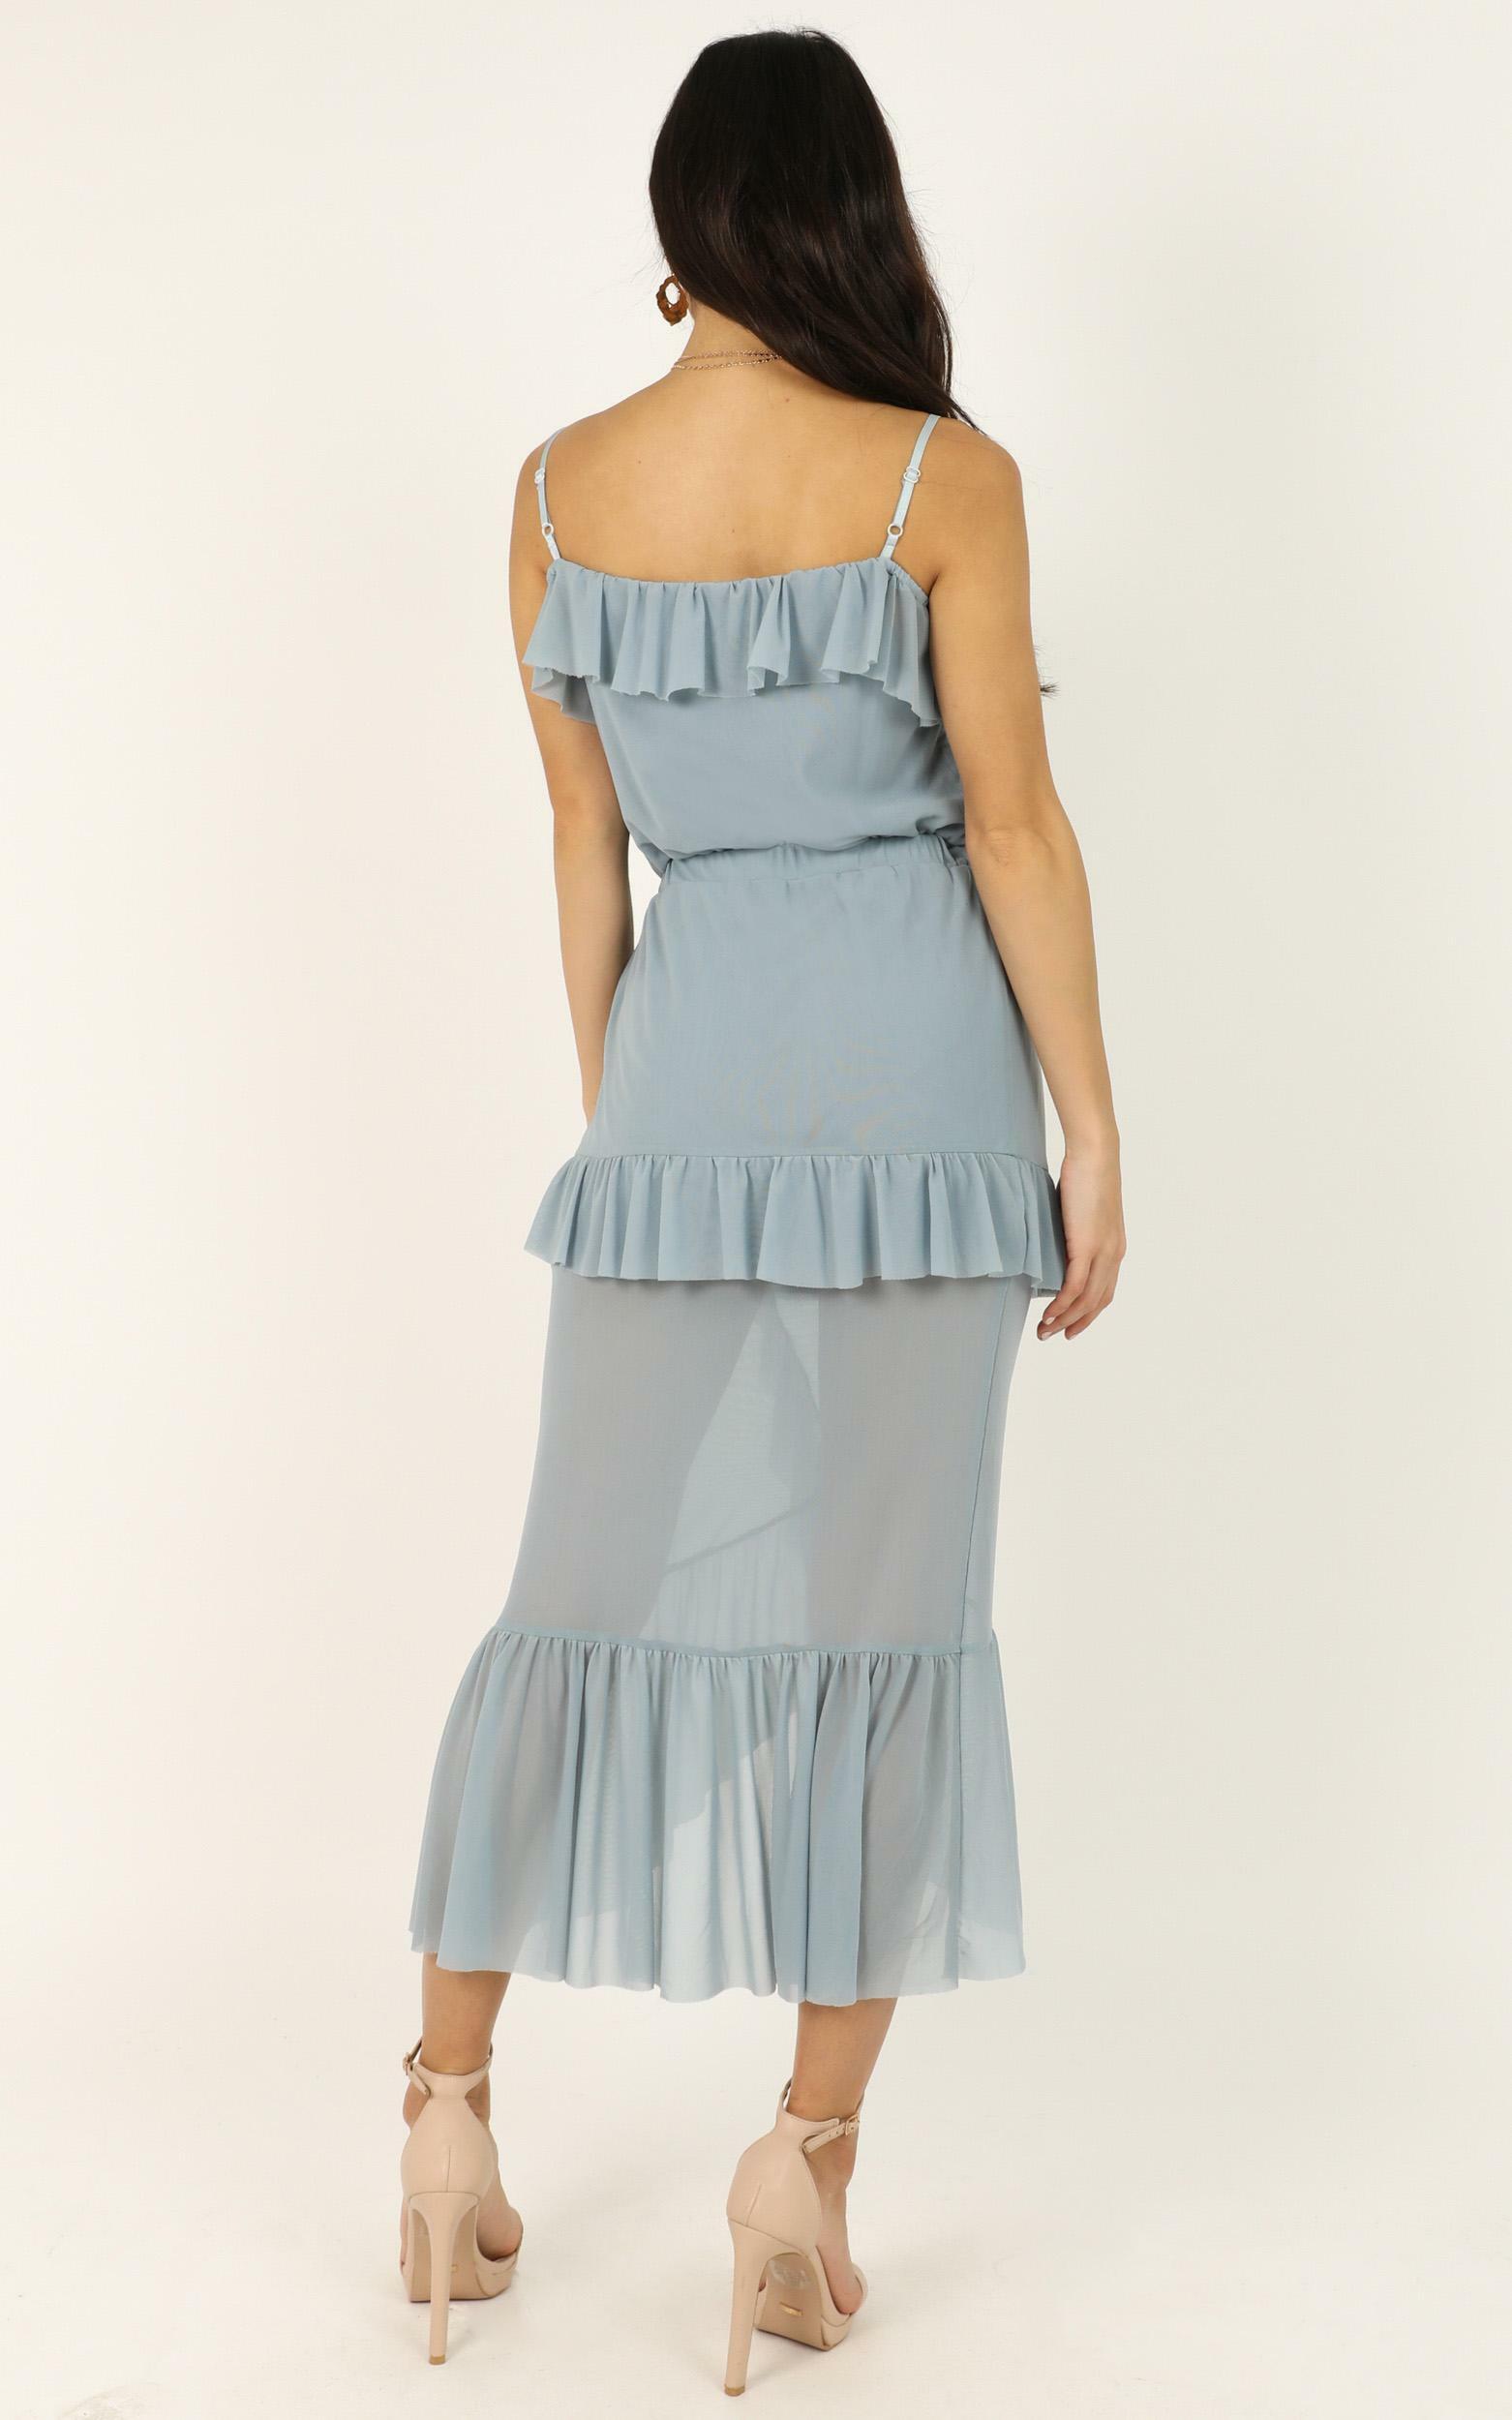 A Little Love Dress in light blue - 14 (XL), Blue, hi-res image number null